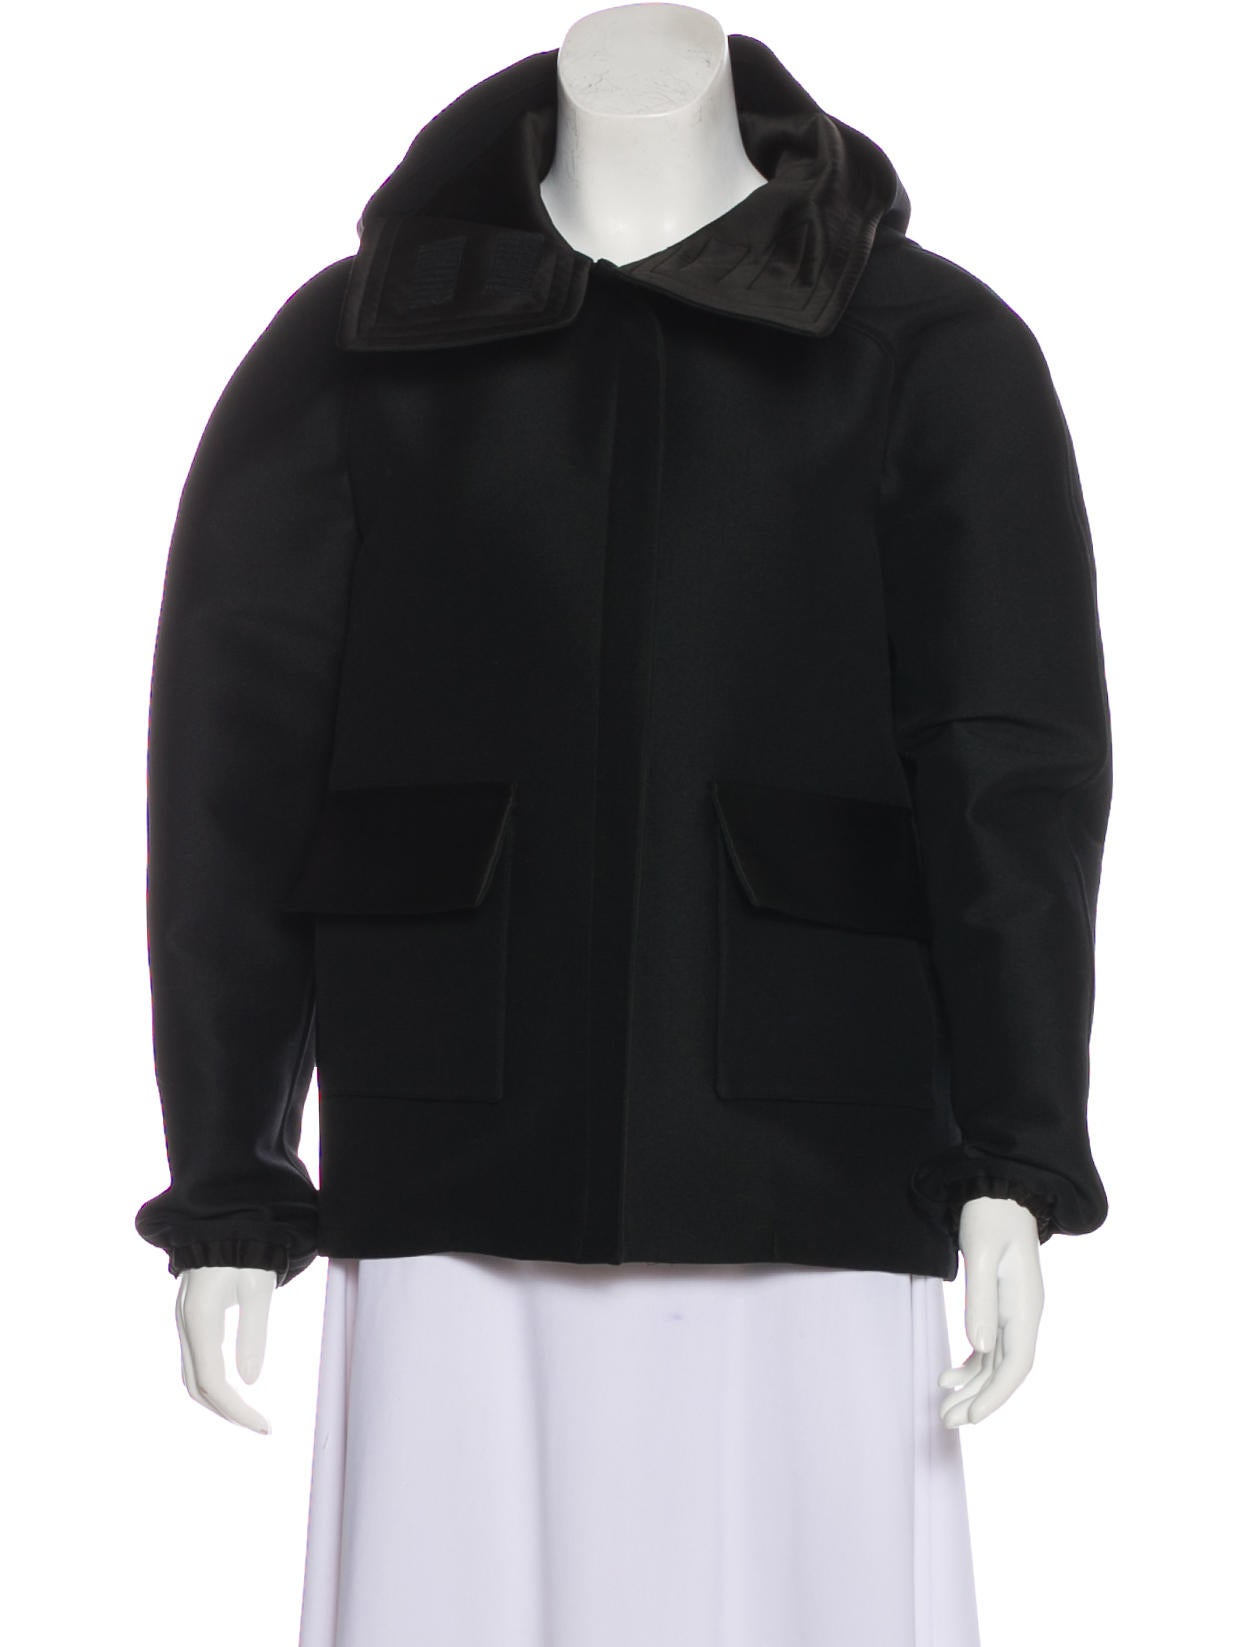 Wool Blend Hooded Jacket by Céline